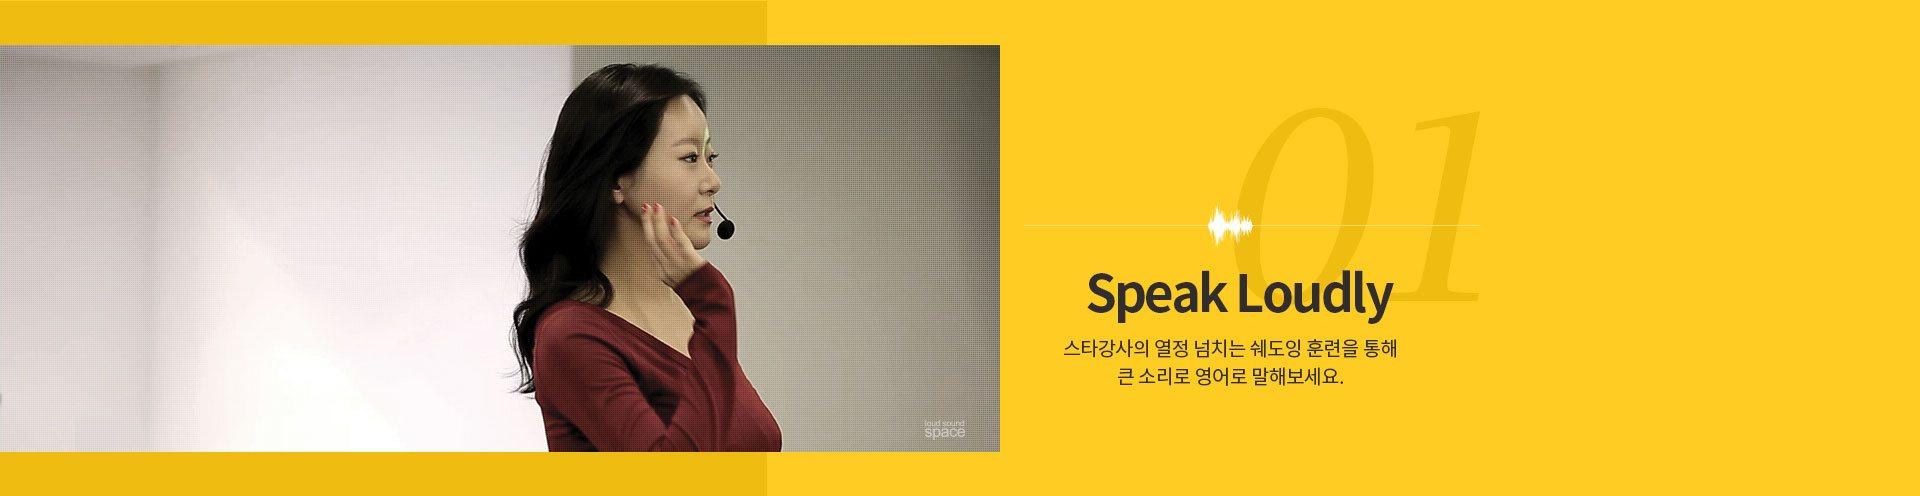 1 Speak Loudly